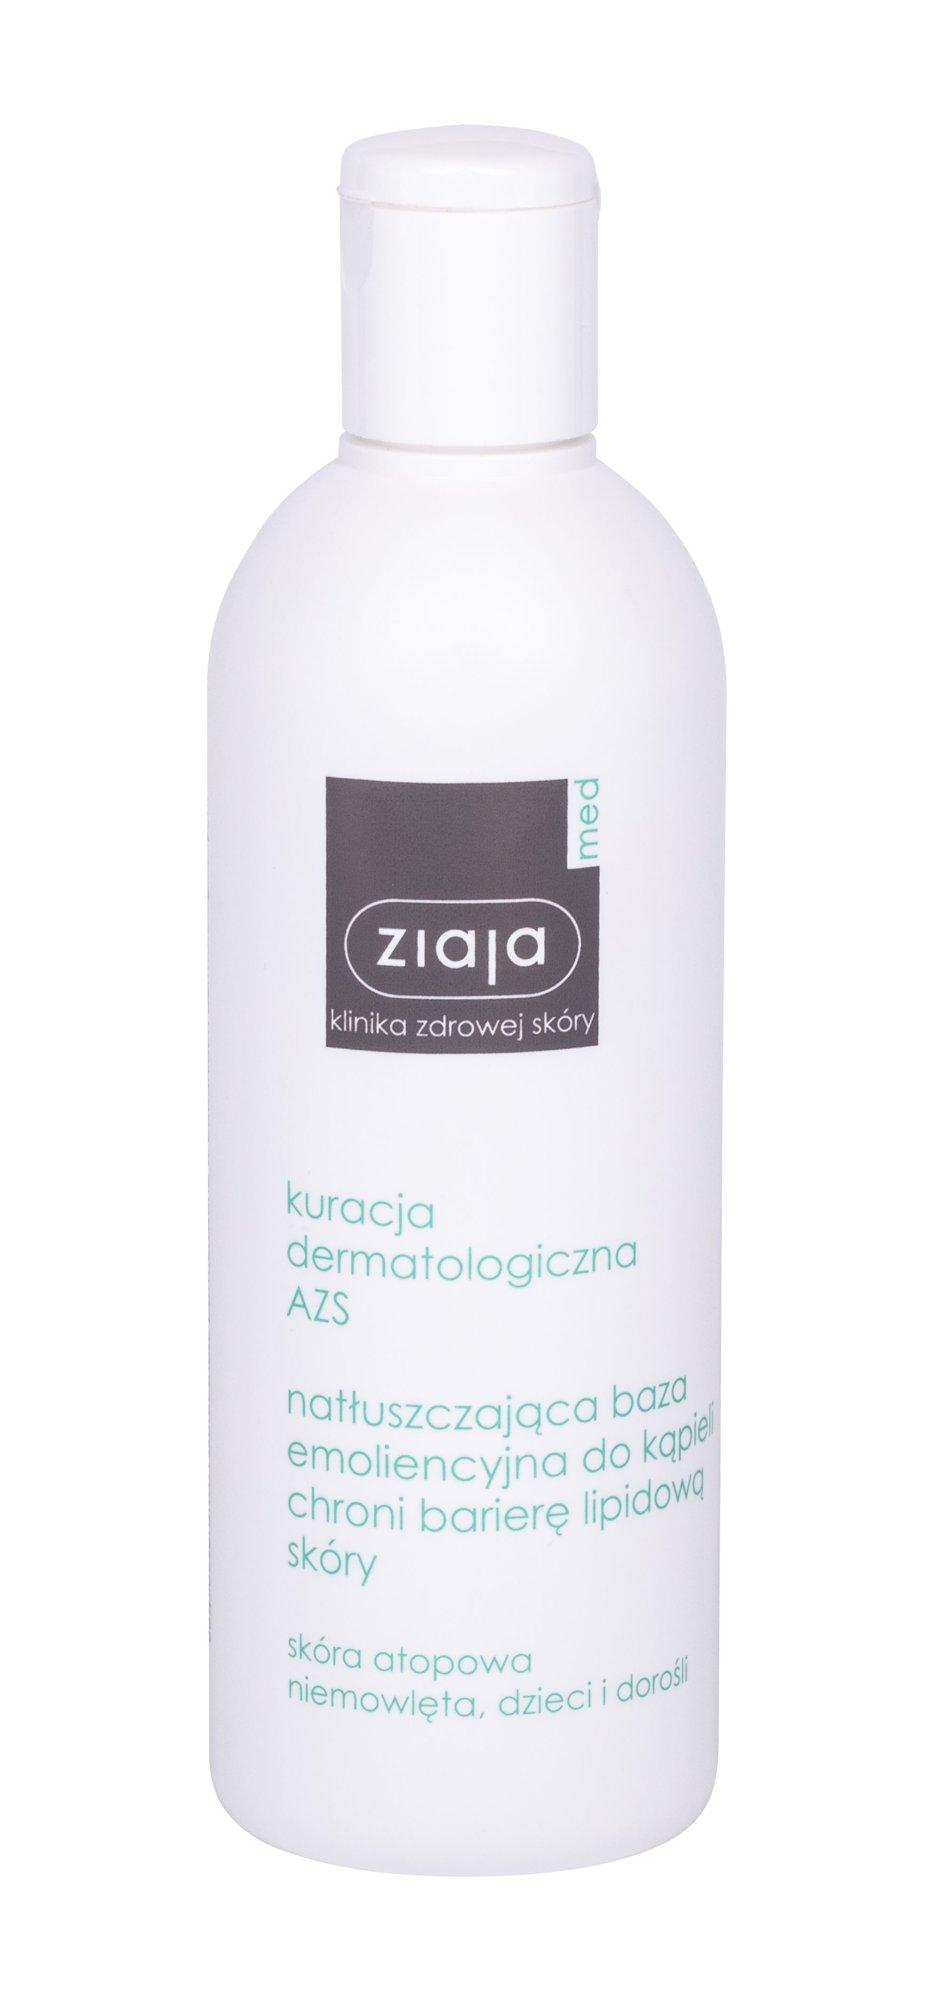 Ziaja Med Atopic Treatment Shower Gel 270ml